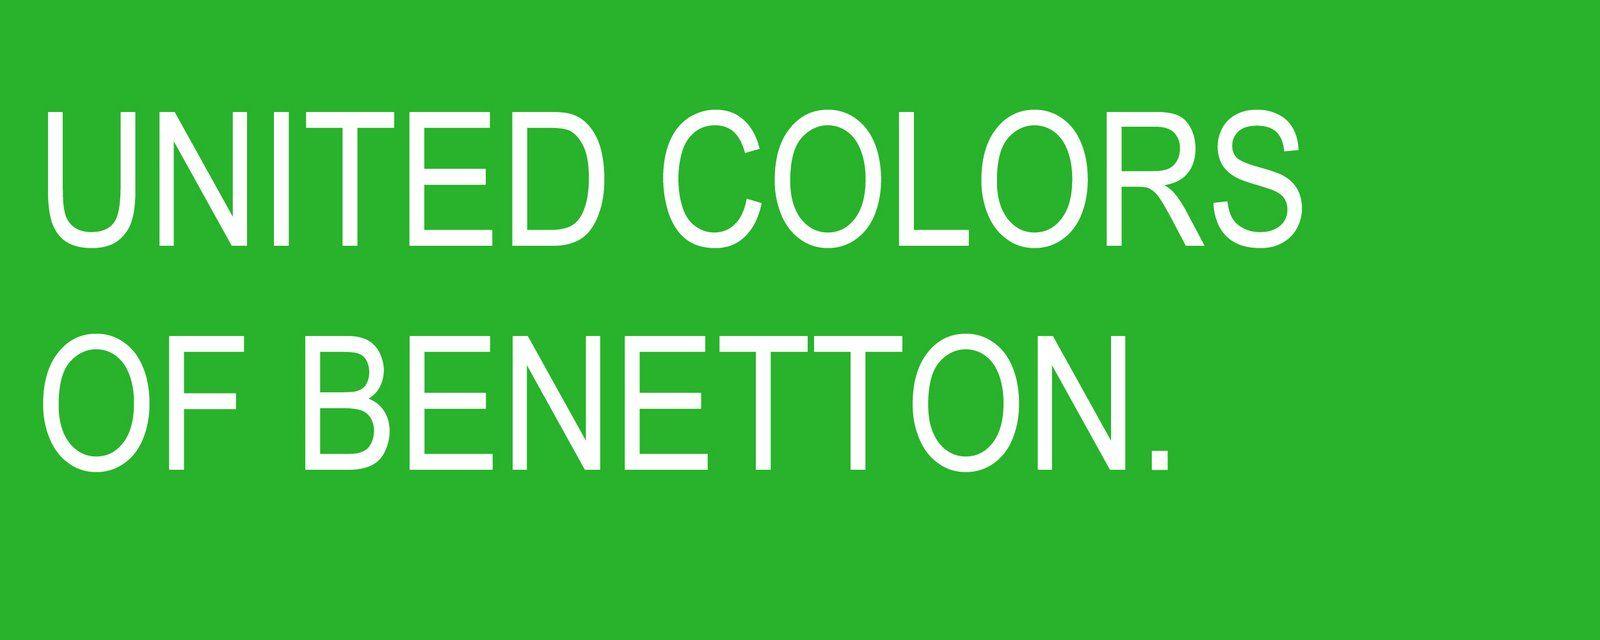 United Colors Of Benetton  - يونايتد كلرز اوف بينتون